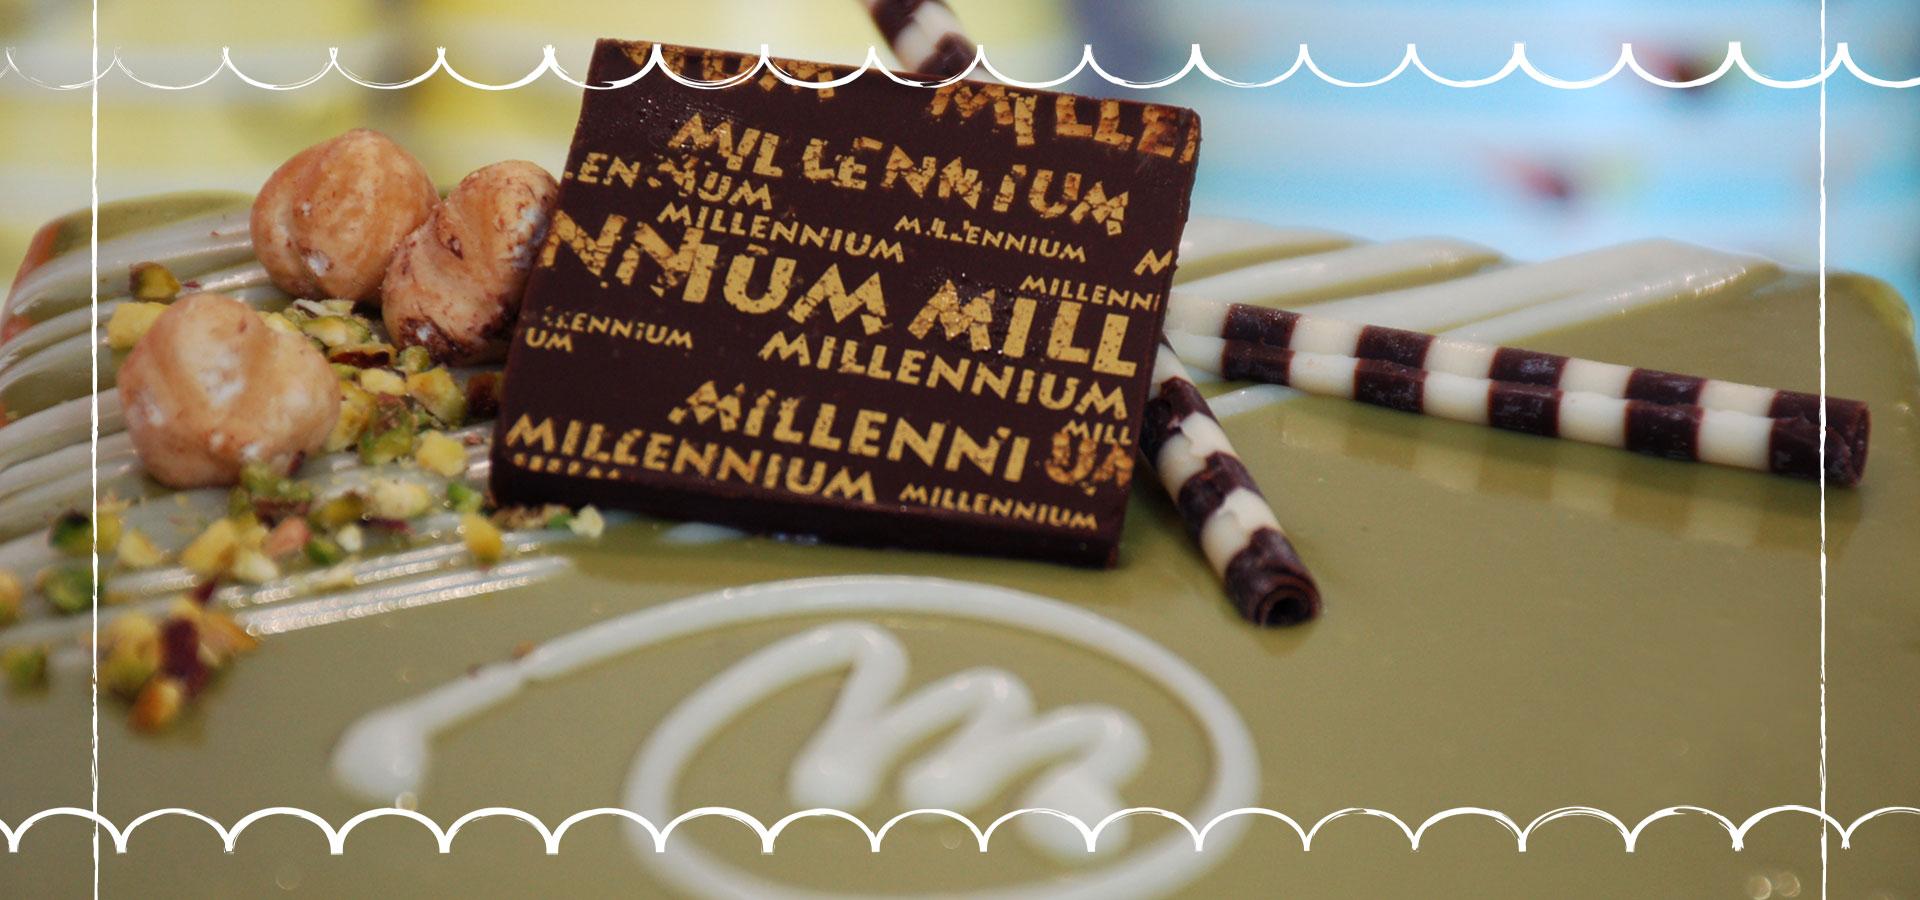 Gelateria Millennium, torte artigianali a Roma Prati